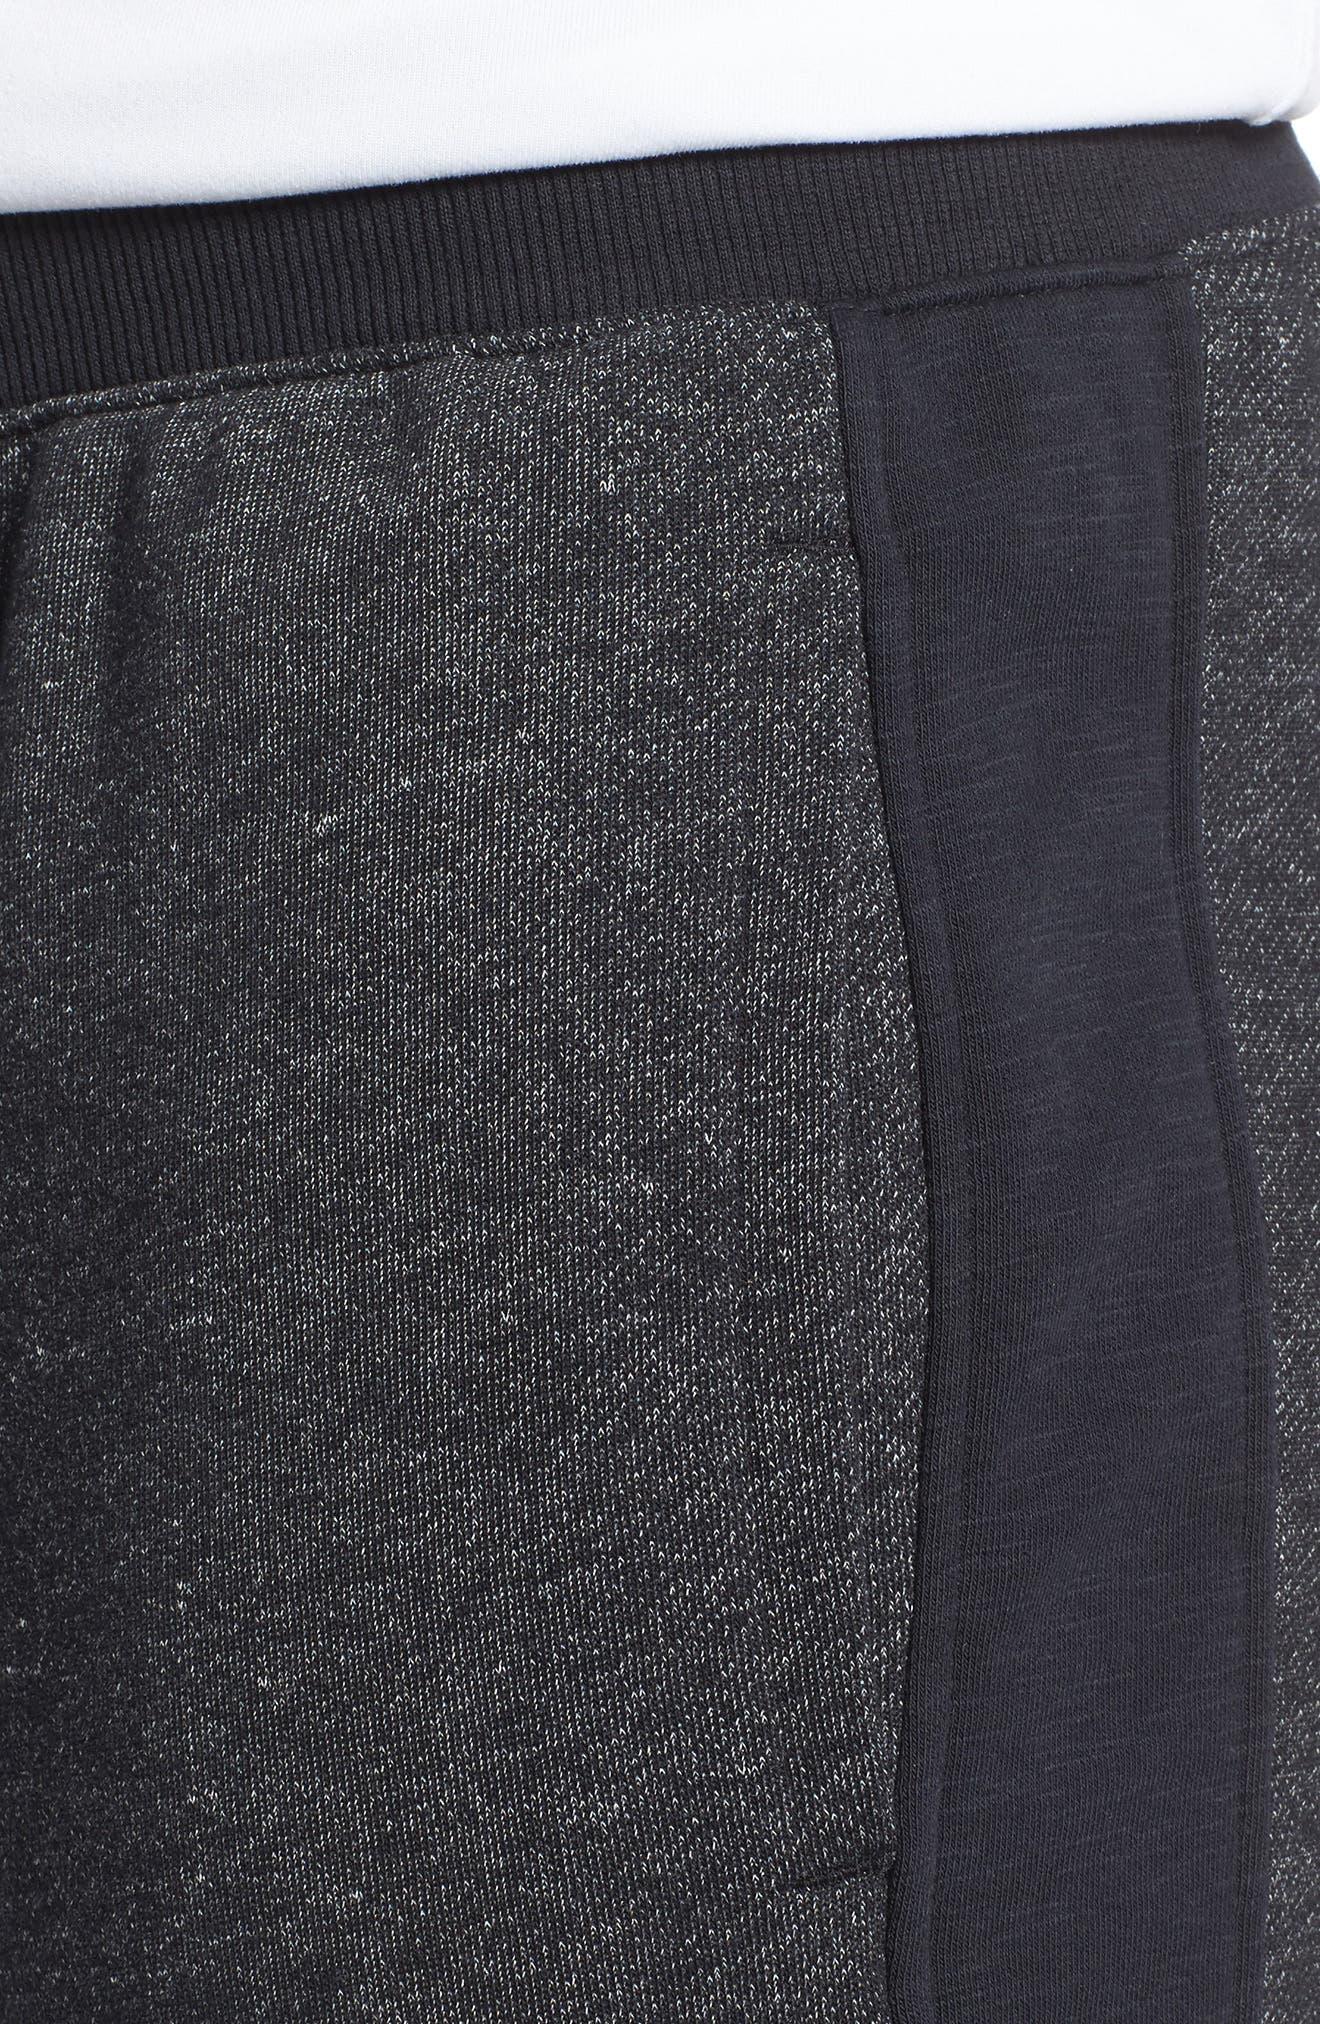 Alternate Image 4  - Under Armour Sportstyle Fitted Fleece Leggings